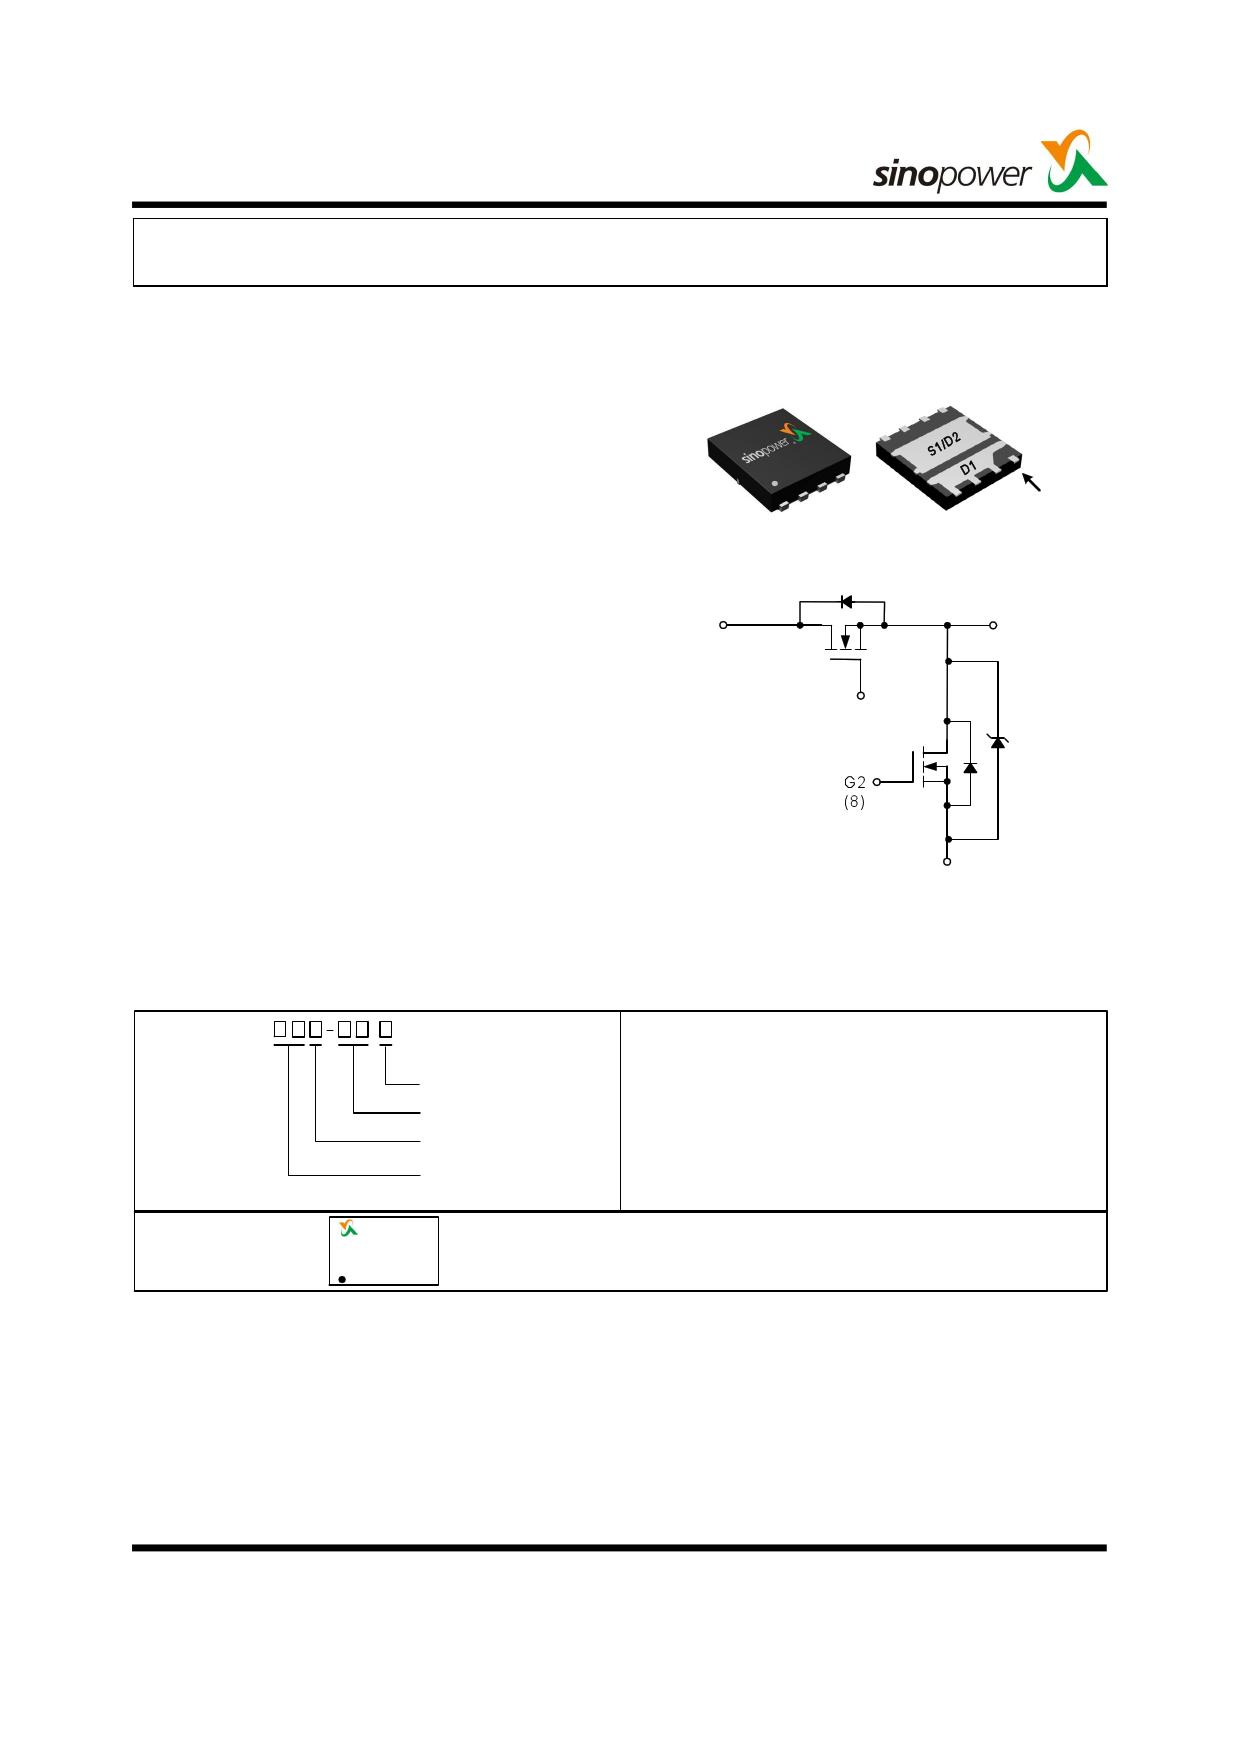 SM7303ESKP datasheet pinout pdf